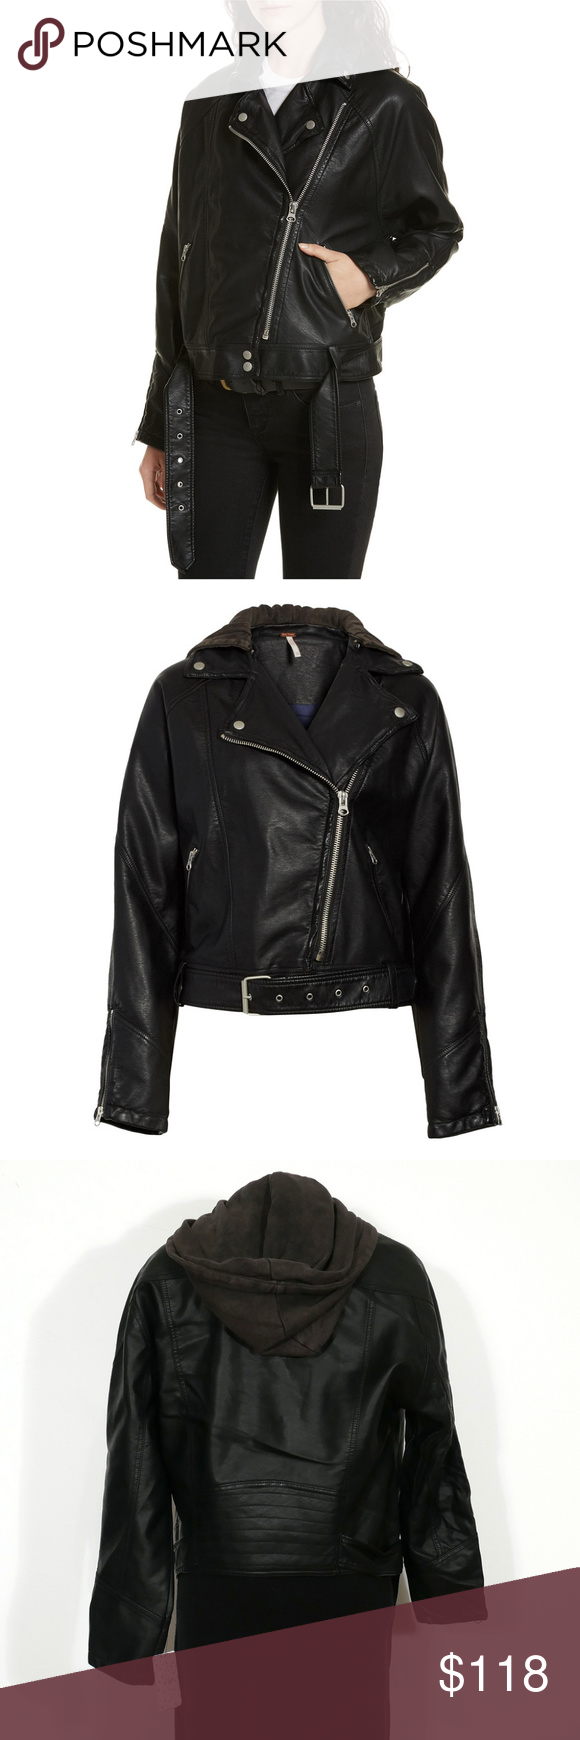 FREE PEOPLE Drapey Faux Leather Moto Hood Jacket S NWT